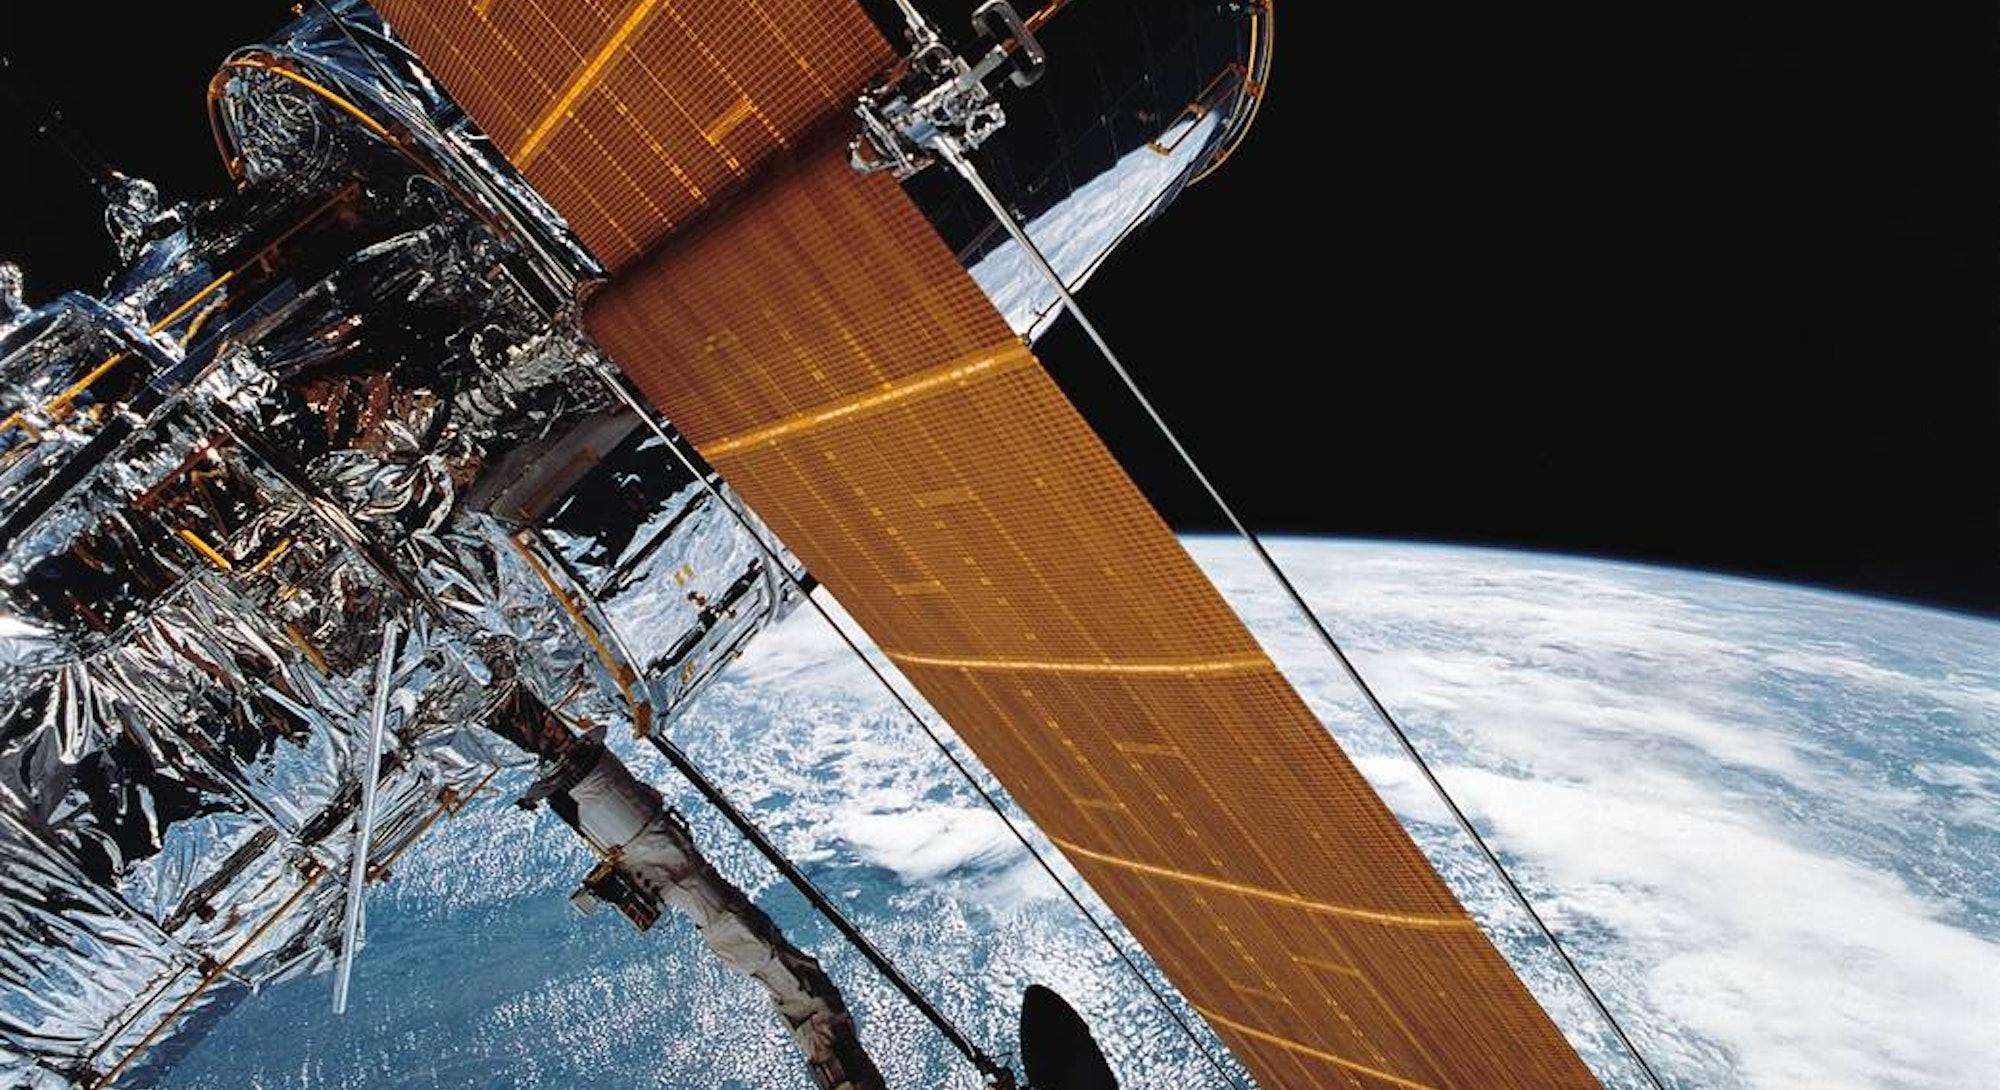 Hubble space telescope above Earth